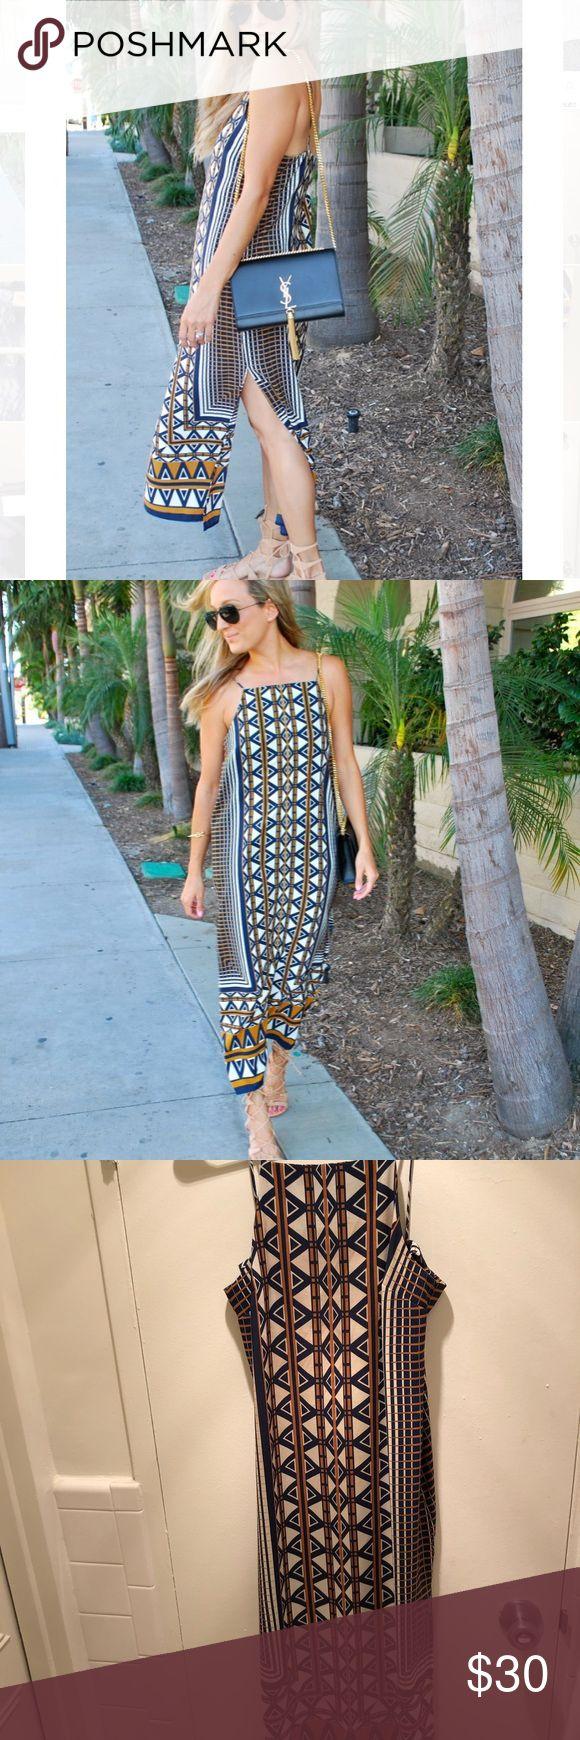 1 day sale! Topshop midi dress 🗿 EUC Topshop midi tribal pattern dress with side slits, gorgeous! 🗿 Topshop Dresses Midi